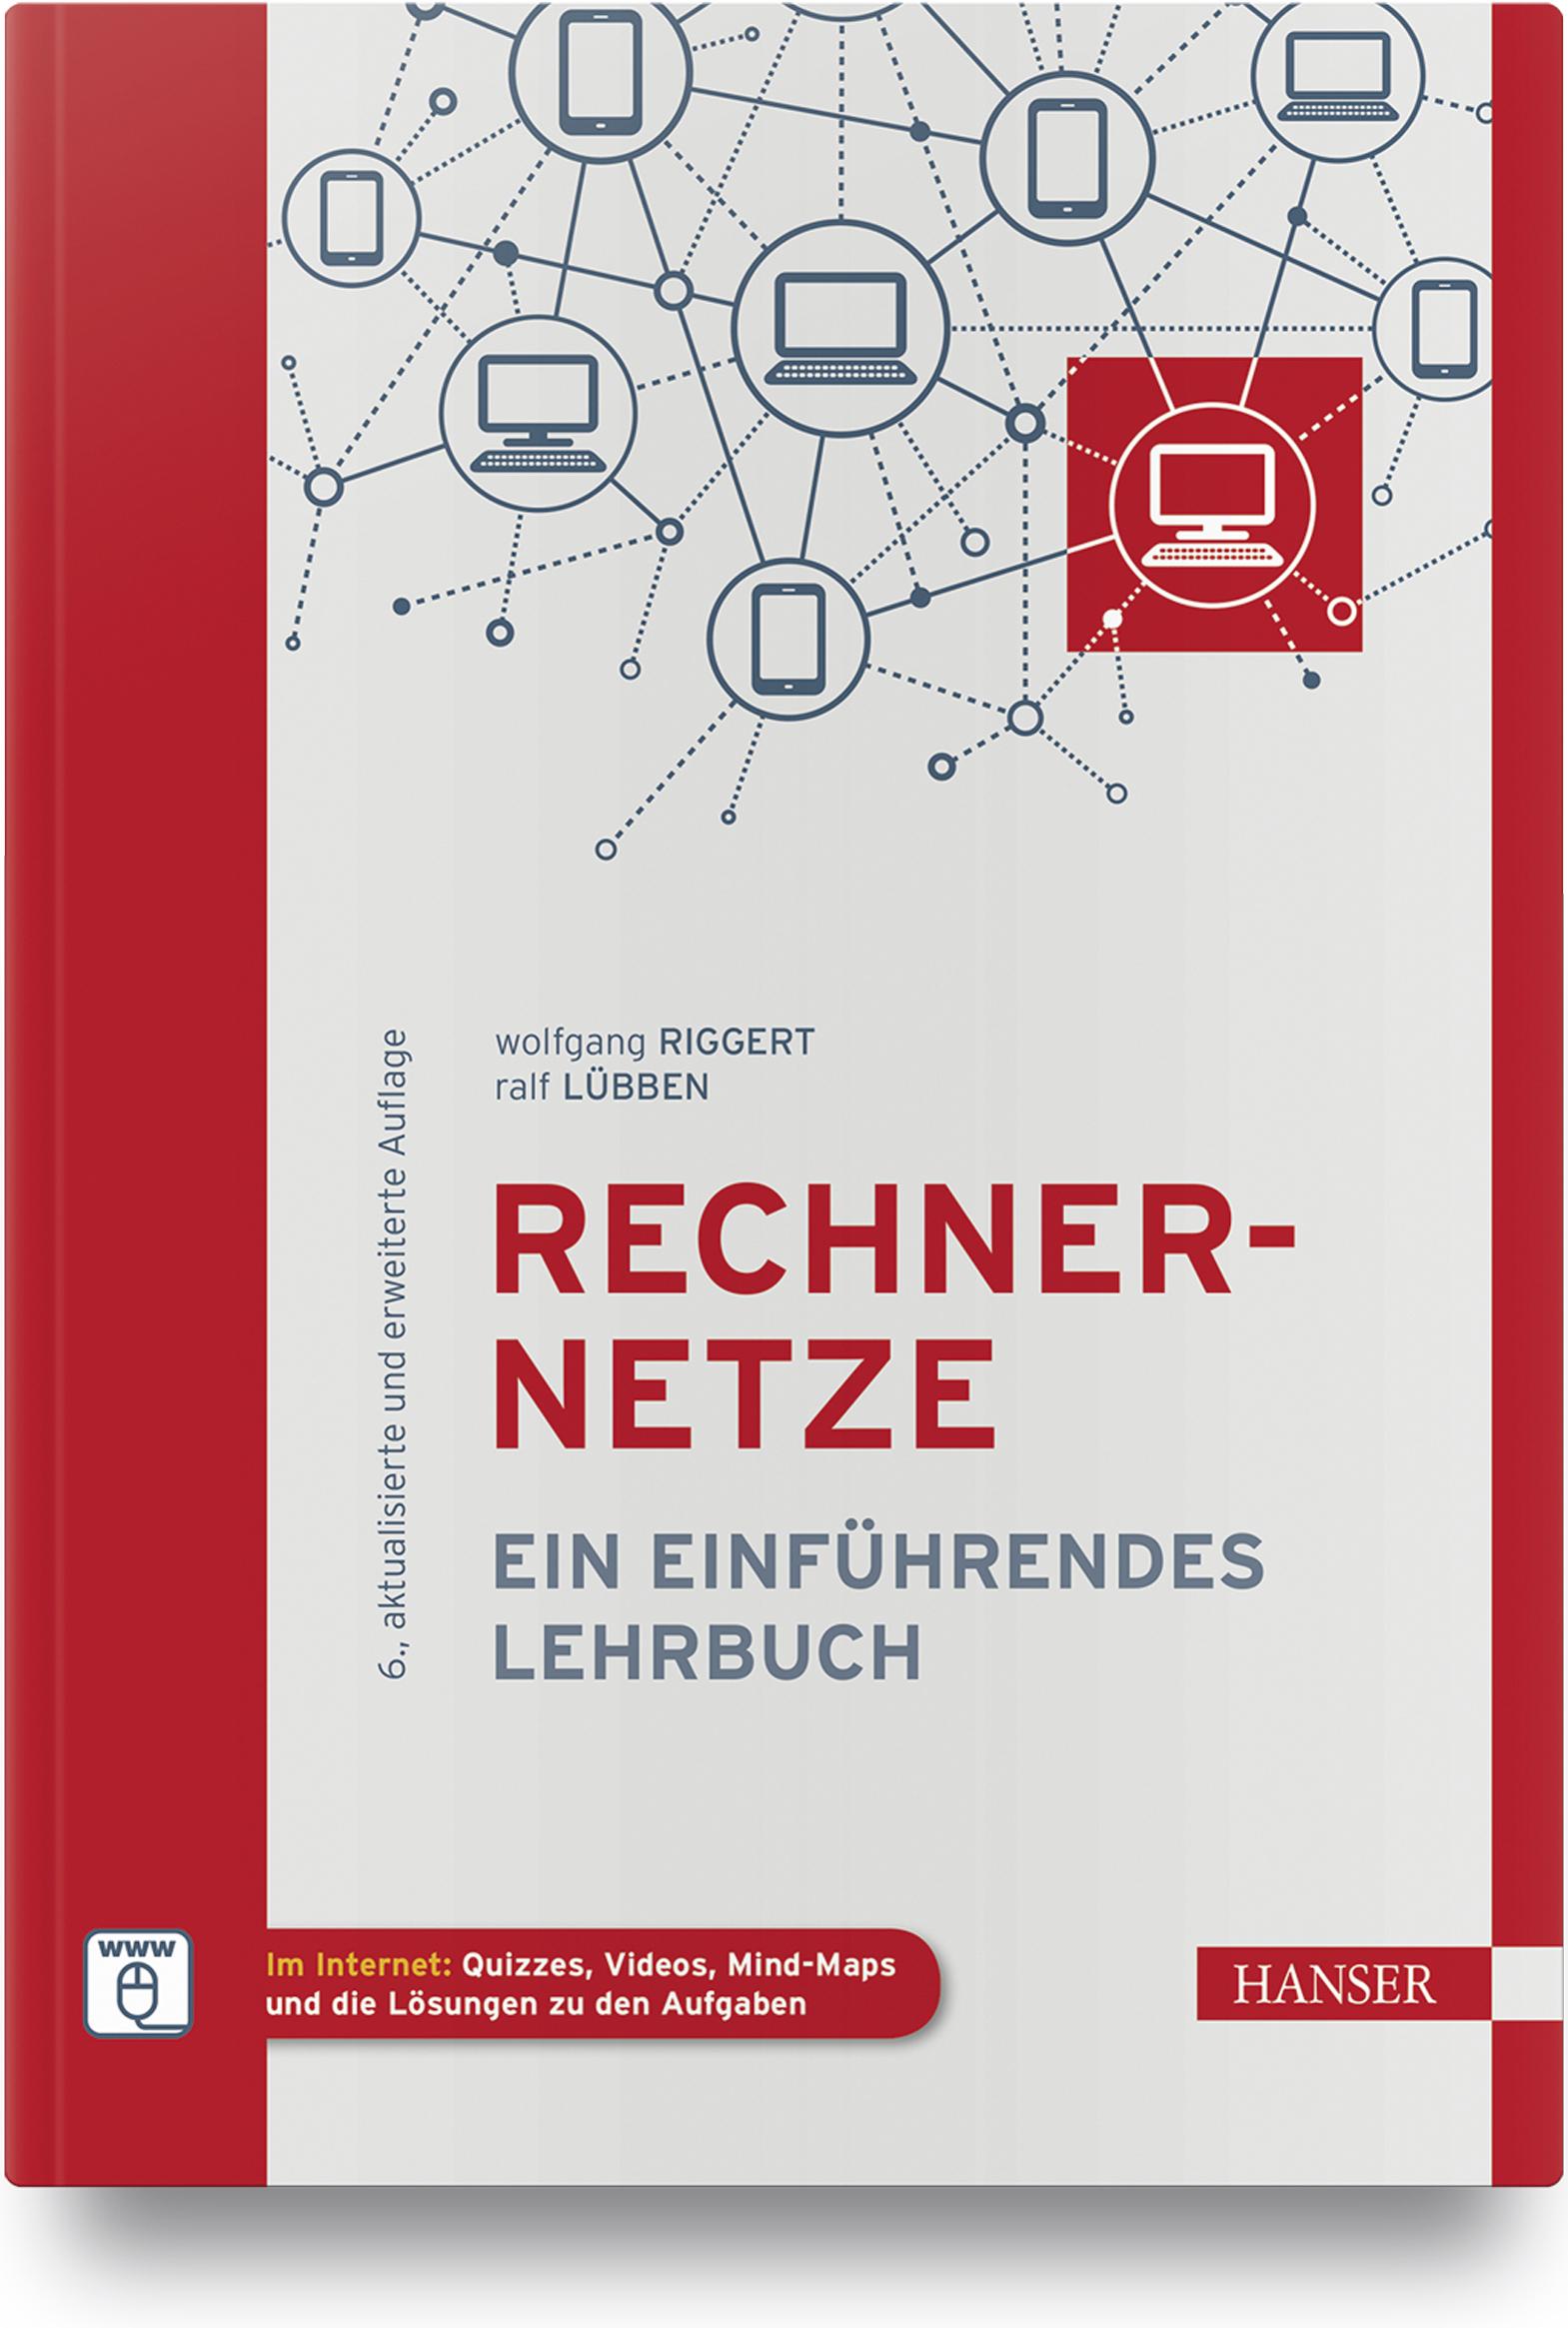 Riggert, Lübben, Rechnernetze, 978-3-446-46309-7